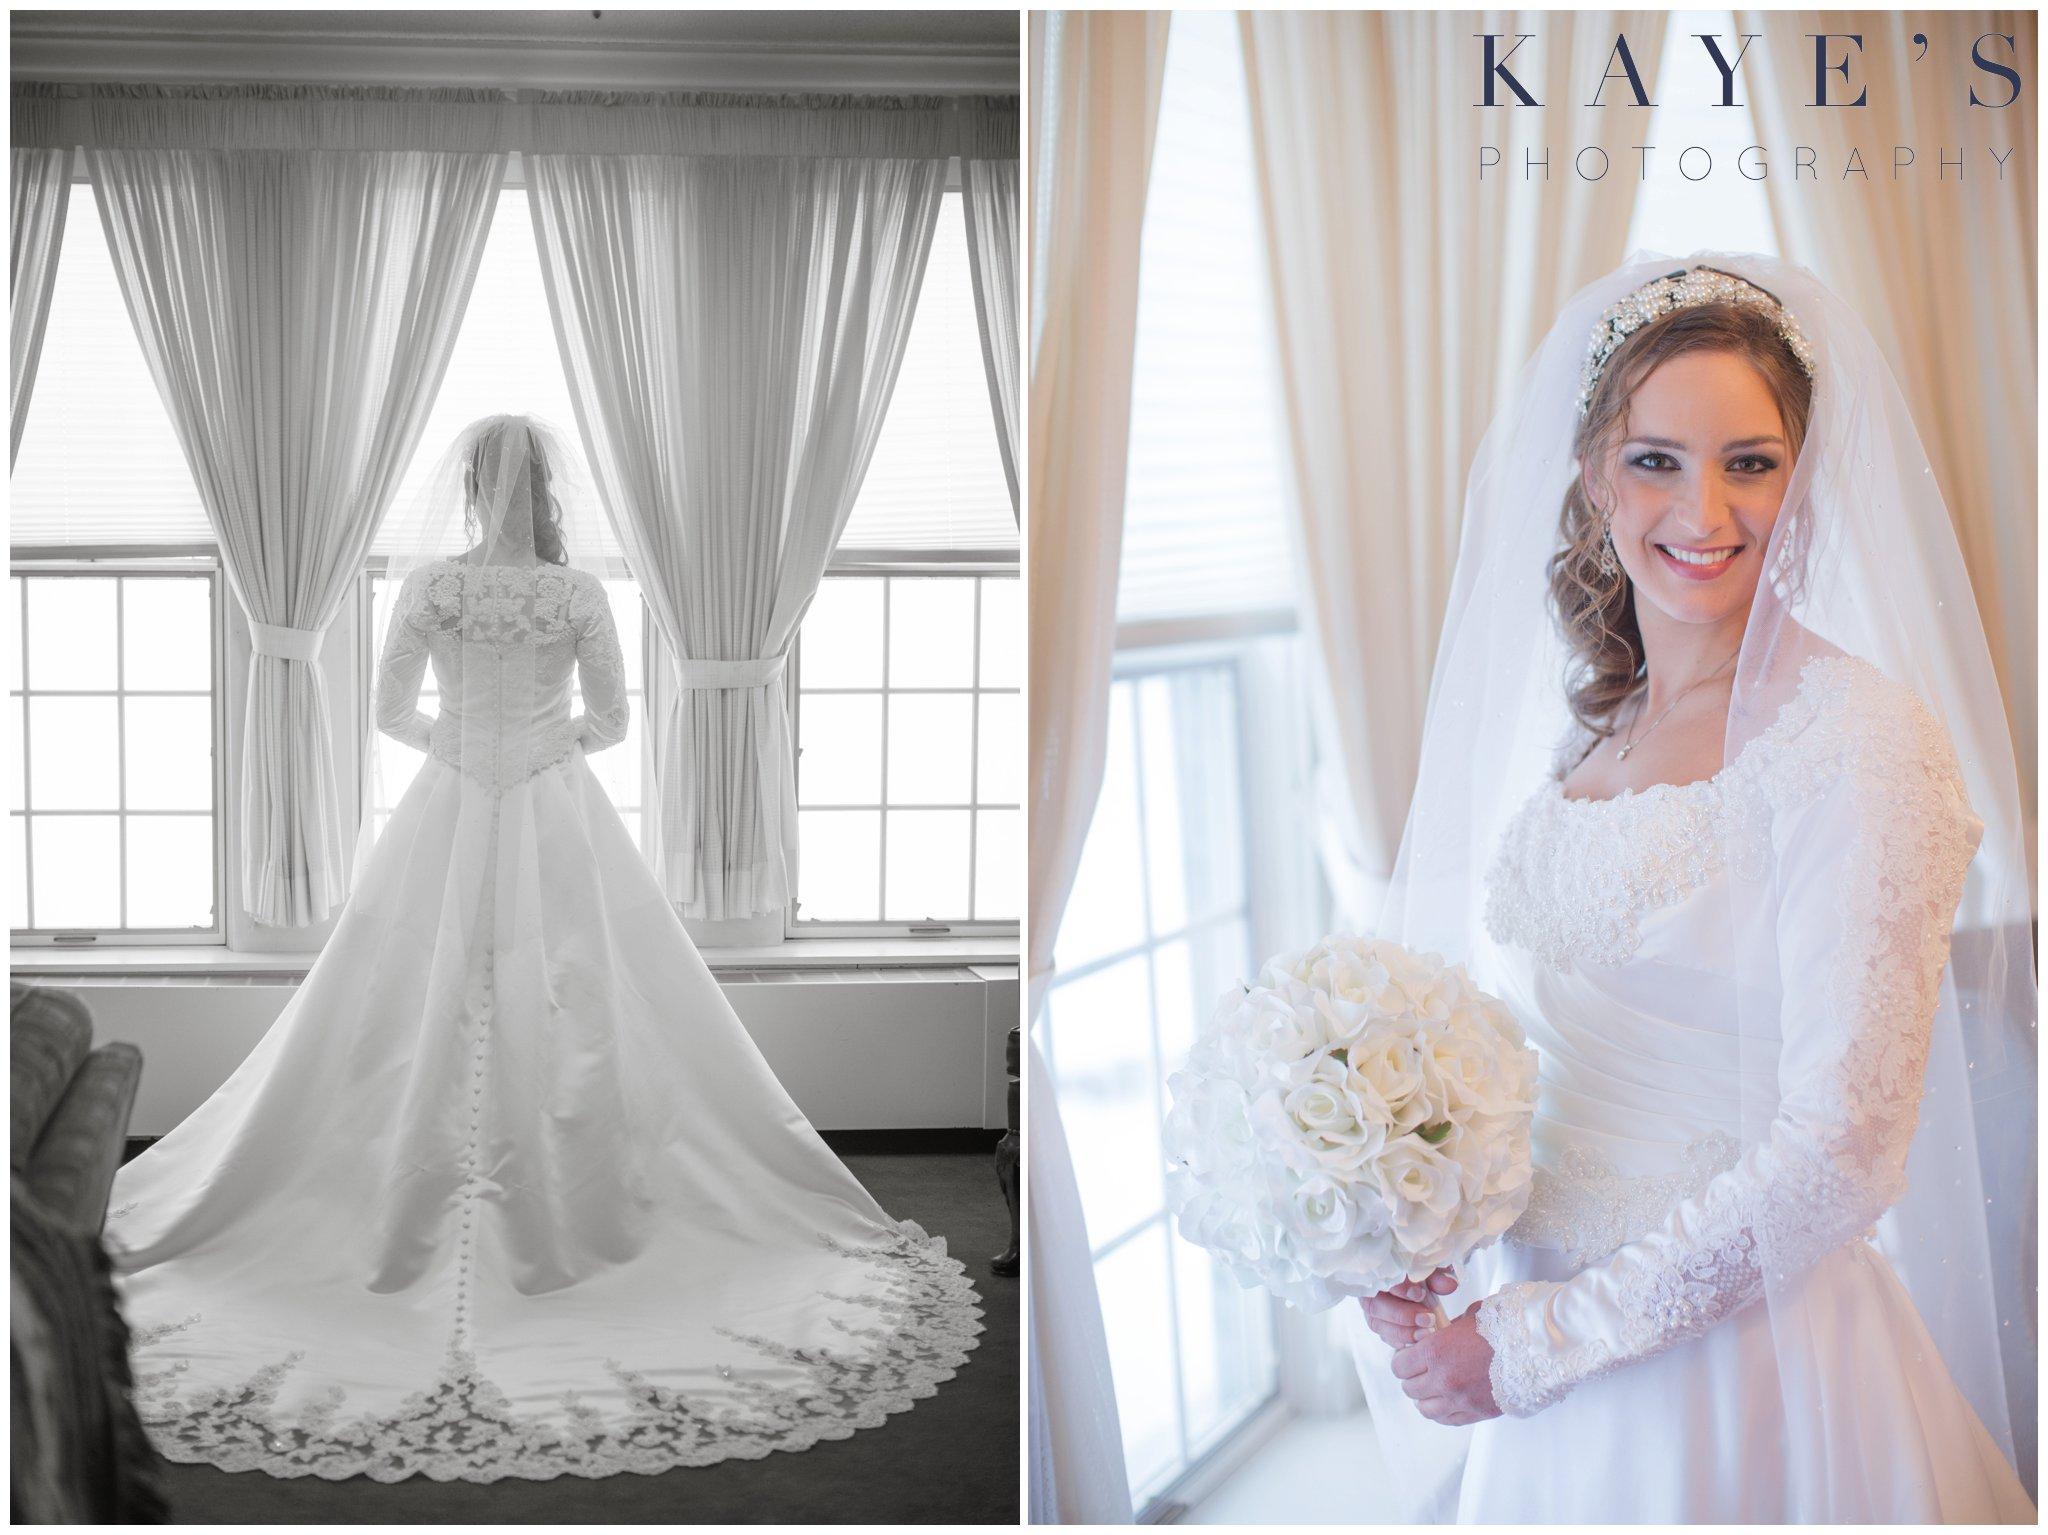 clarkston portrait photographer, clarkston best photography, bride alone, bride by window, bride holding bouquet, bride in dress